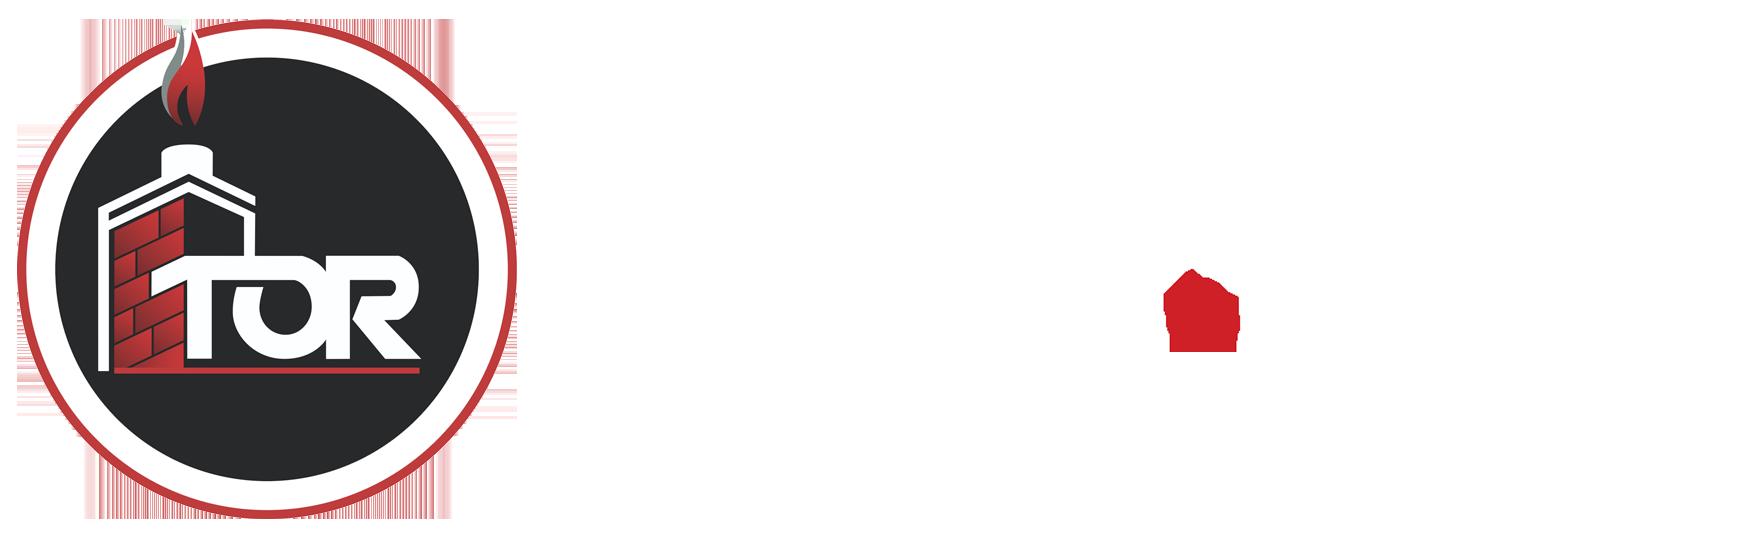 Tor Chimney & Fireplace